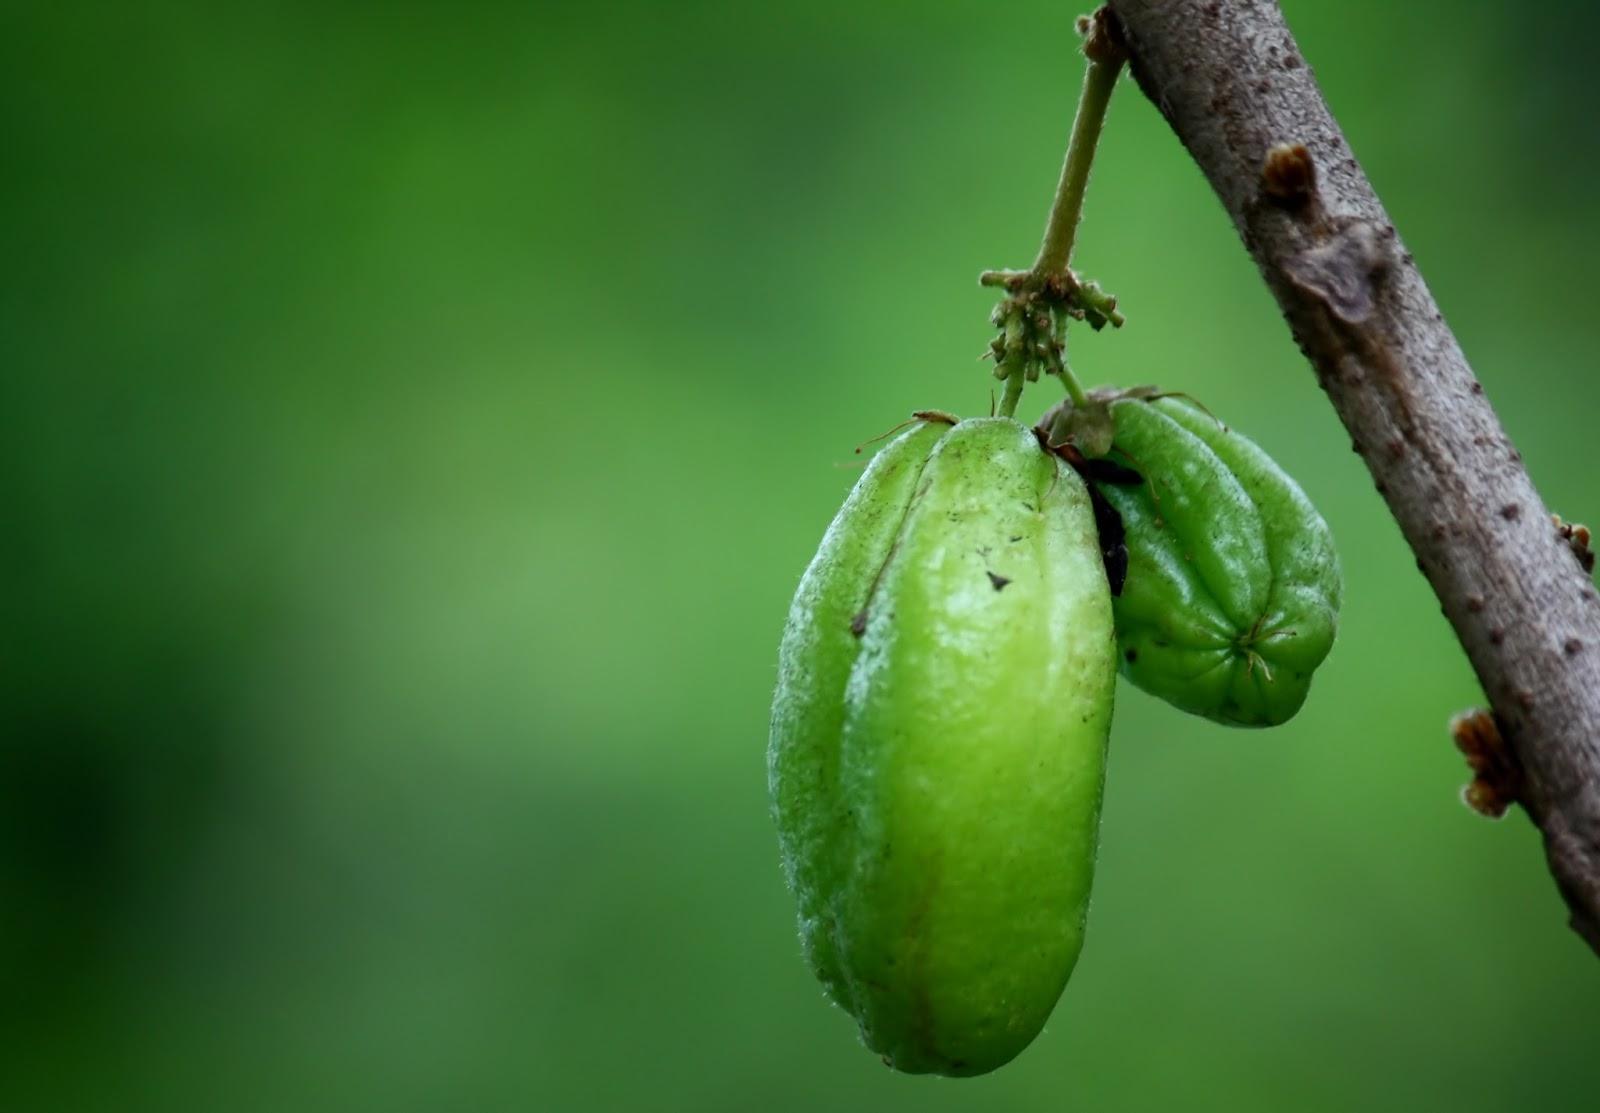 Cara Mudah Menyembuhkan Asam Urat, Hindari 30 Makanan Pantangan